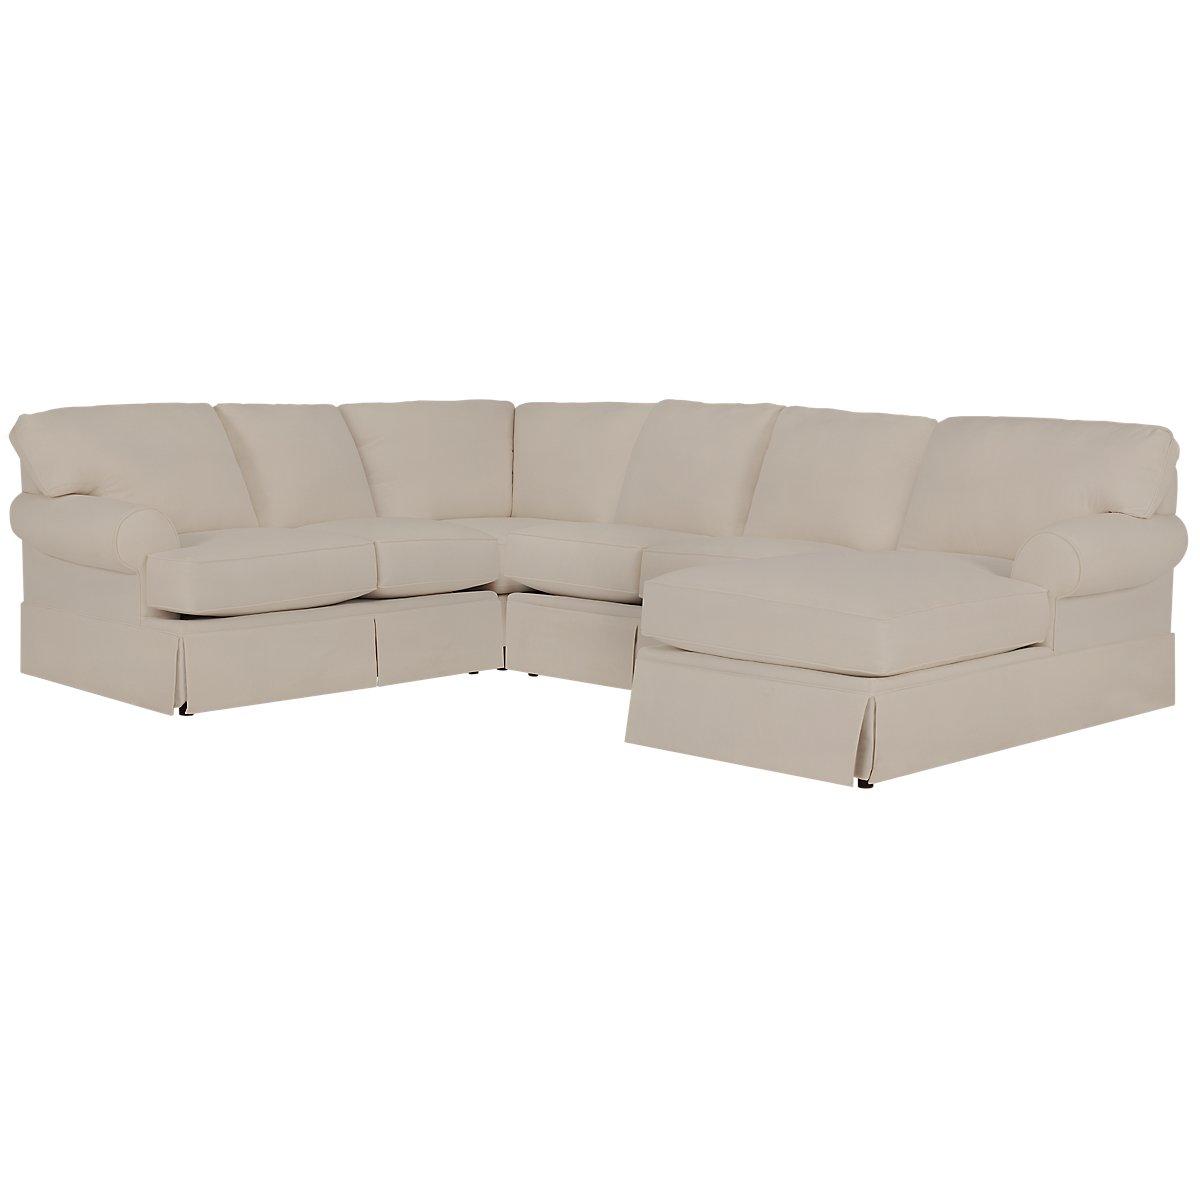 City furniture turner khaki fabric medium right chaise for Chaise kaki